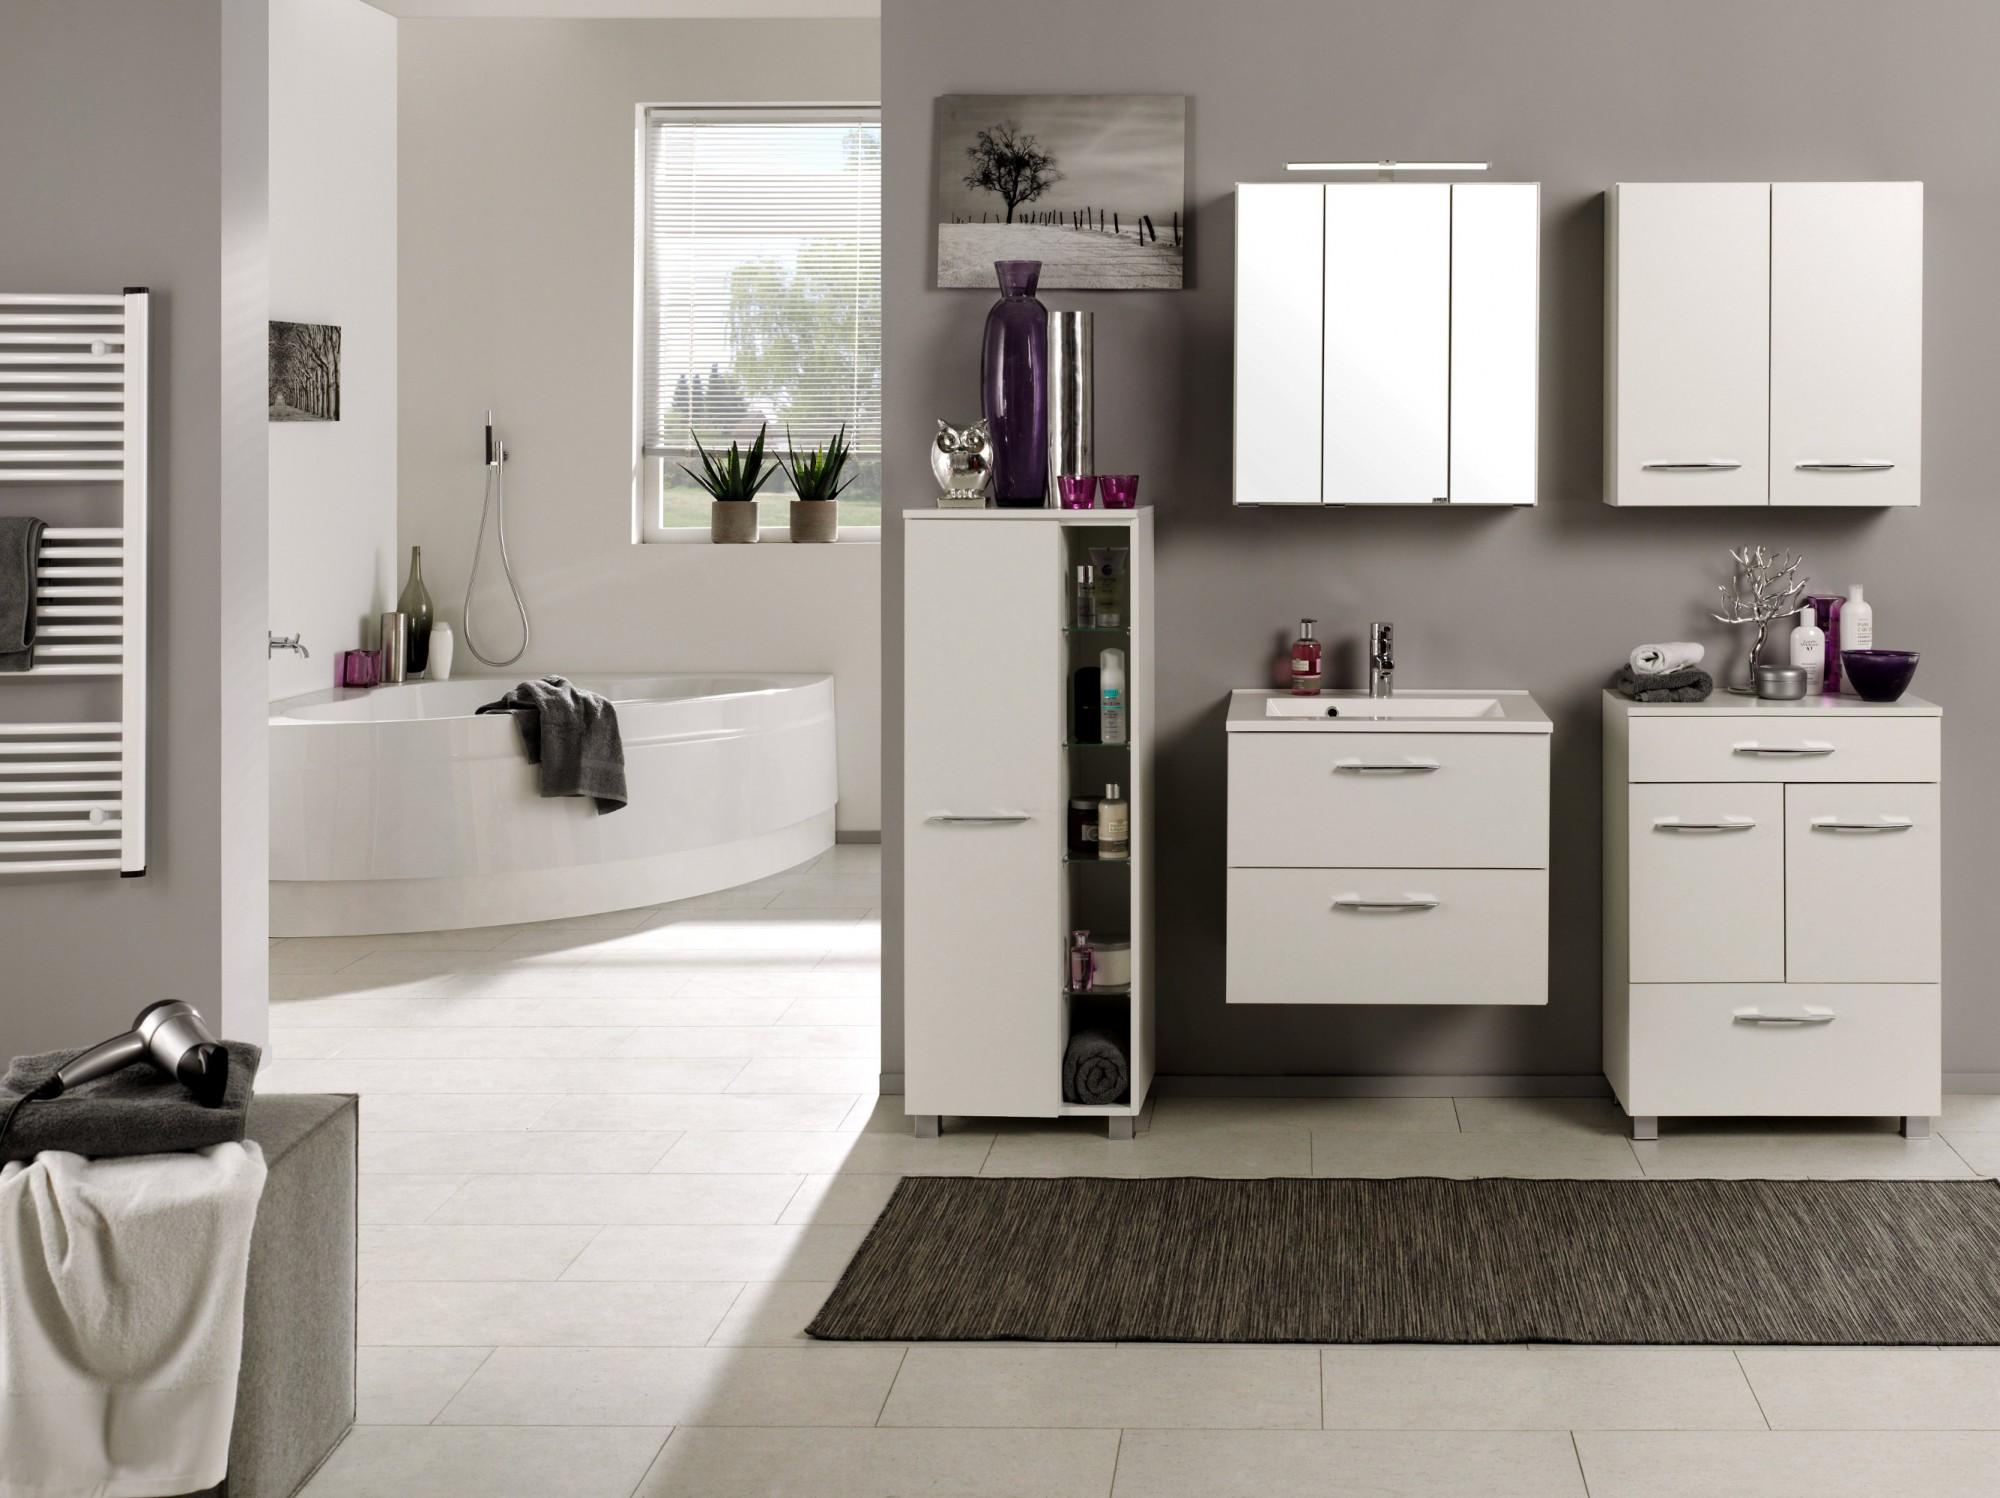 bad midischrank portofino 1 t rig 5 regalf cher 45 cm breit wei bad bad midischr nke. Black Bedroom Furniture Sets. Home Design Ideas